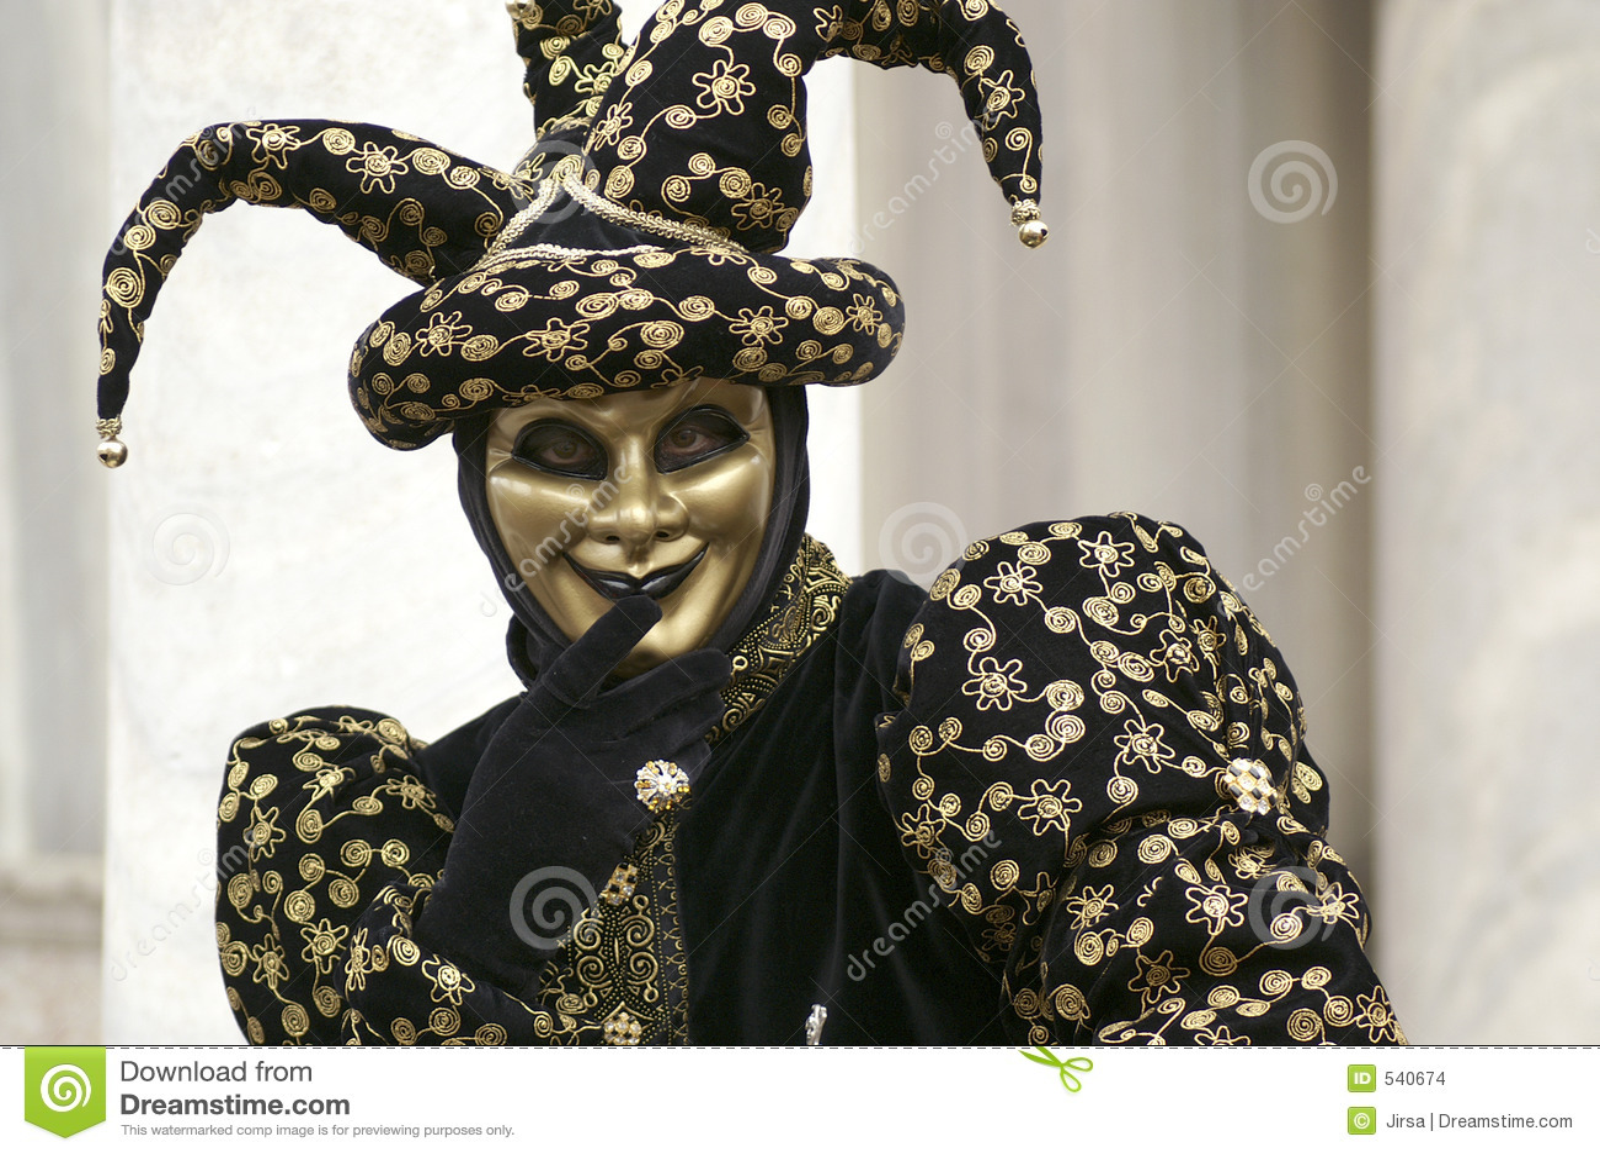 Download 屏蔽 库存照片. 图片 包括有 意大利, 威尼斯, 服装, 五颜六色, 节假日, mardi, 隐藏, 狂欢节 - 540674